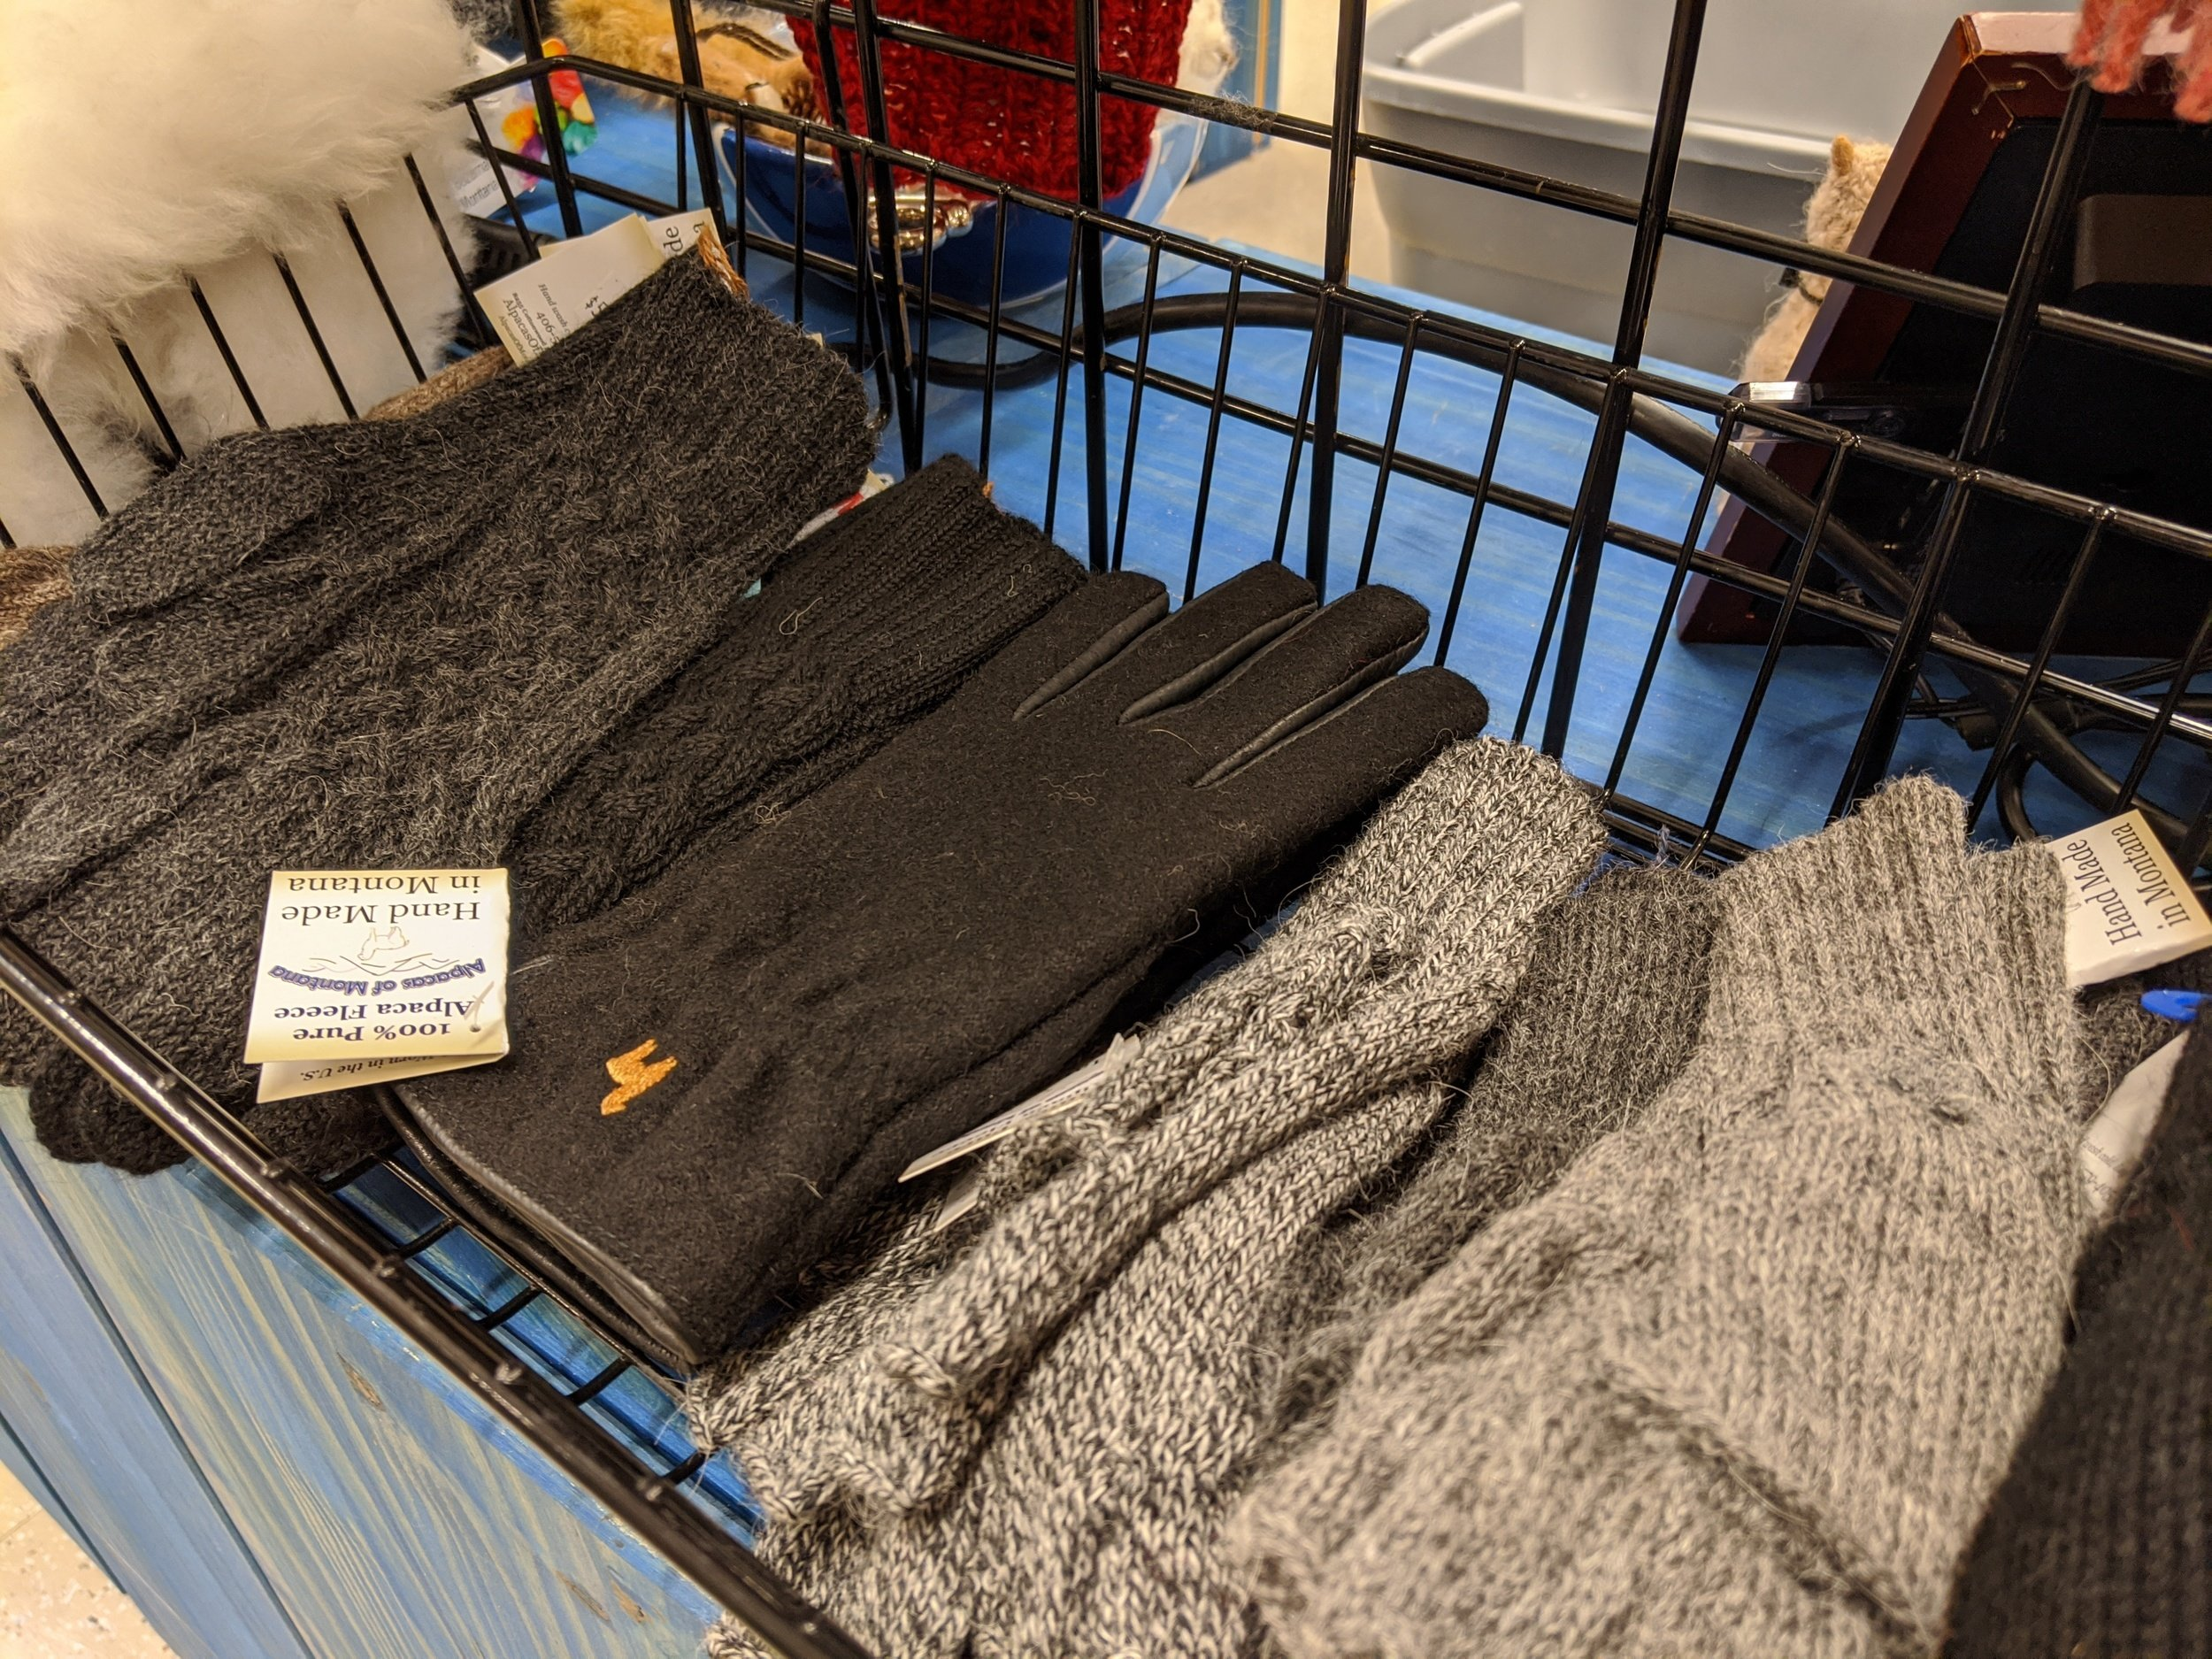 owenhouse ace hardware wool gloves sale - Bozeman, Montana